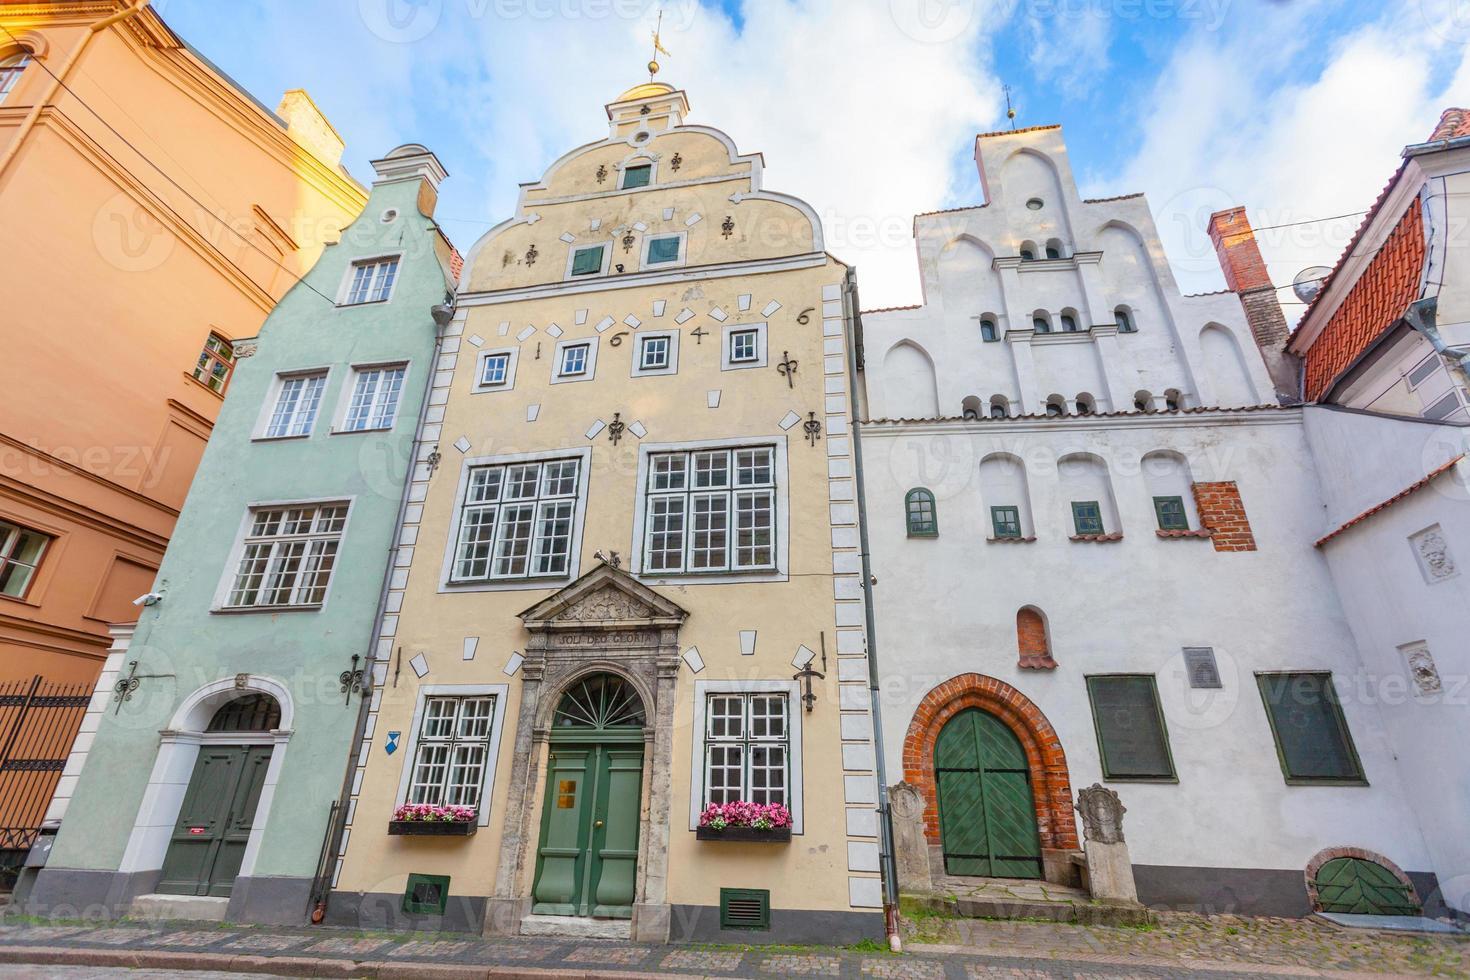 Drei Brüder Häuser in Riga foto